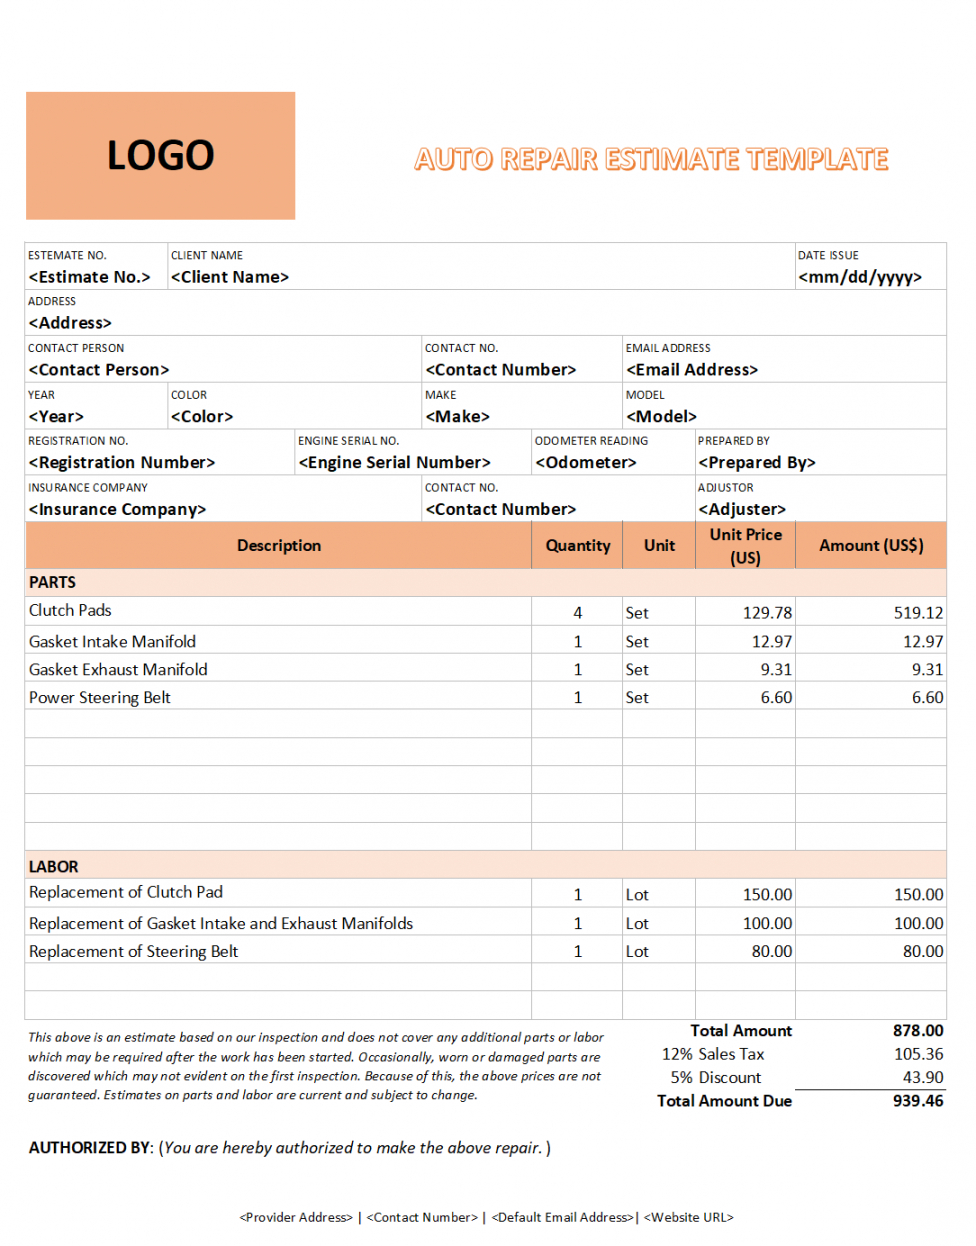 download auto repair estimate template in 2020  estimate vehicle repair estimate template excel